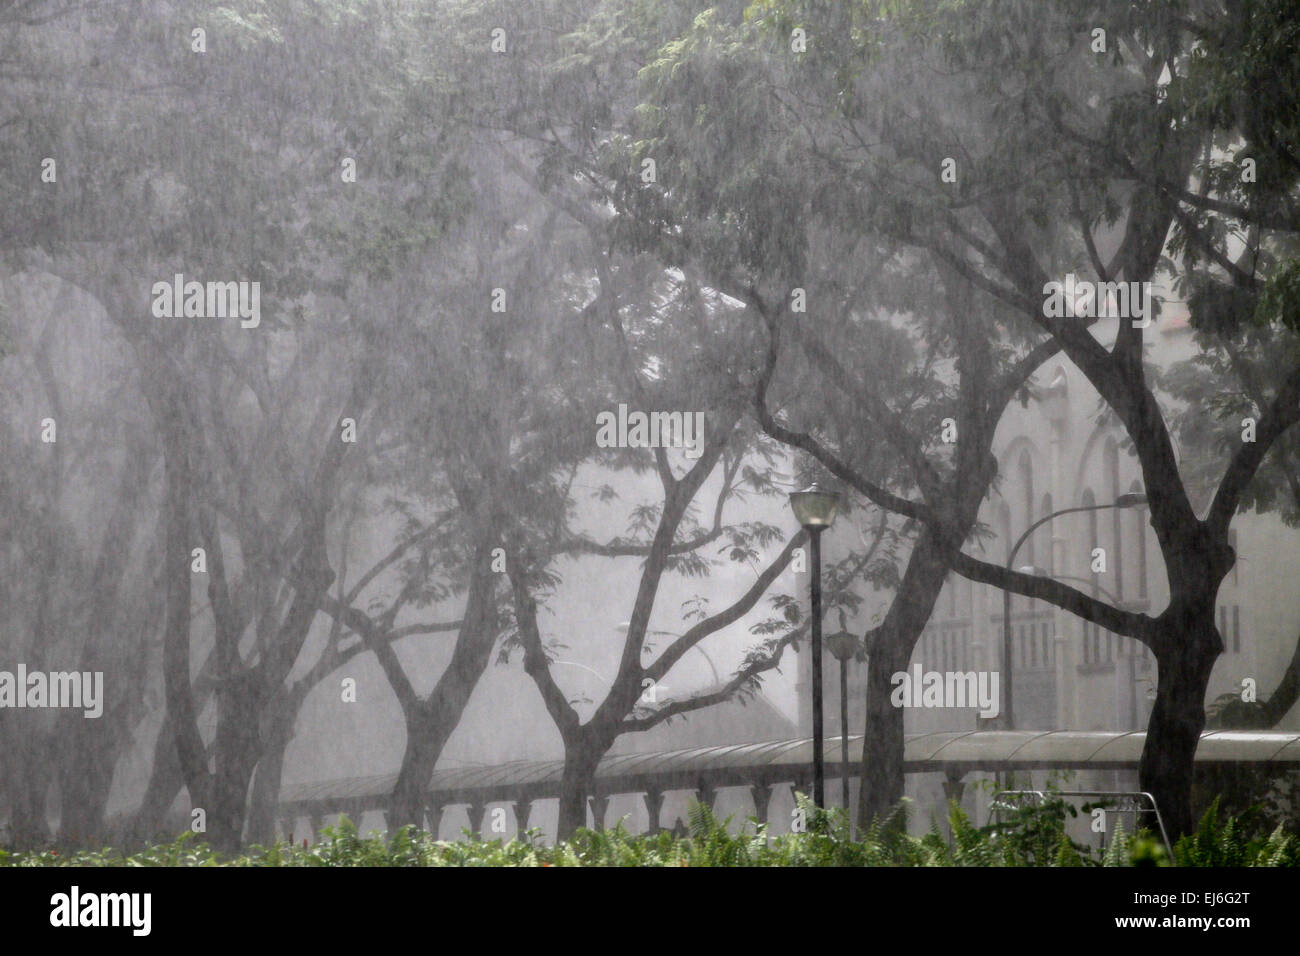 Monsoon rainstorm in Singapore - Stock Image